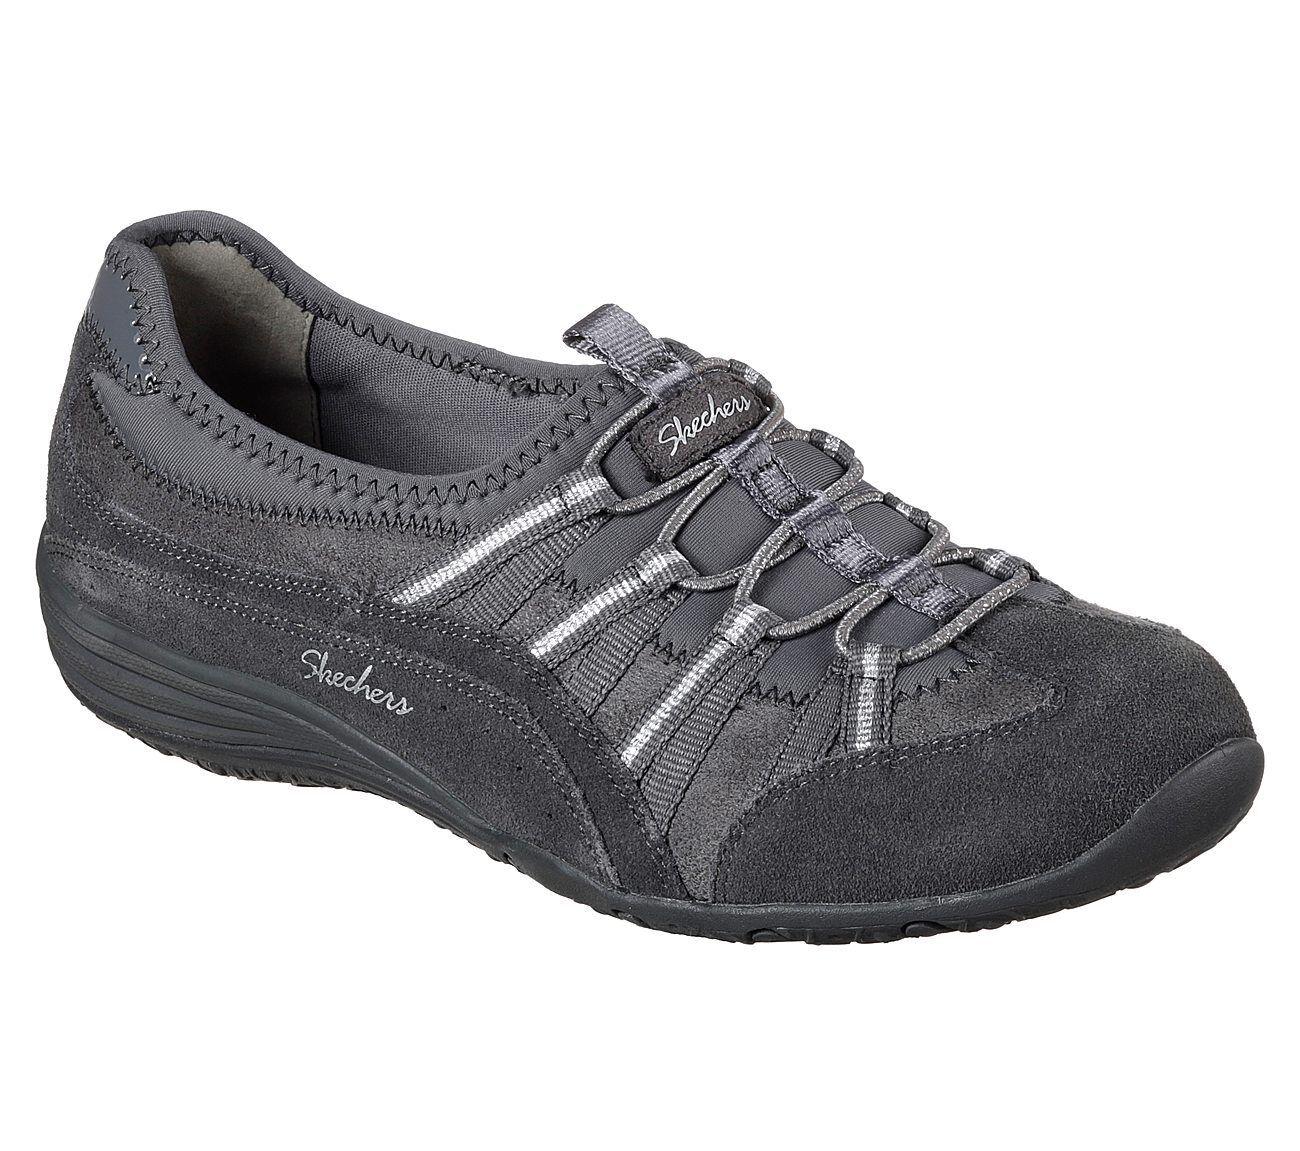 Skechers Unity - Beaming Trainers Womens Shoes Classic Memory Foam Flats Shoes Womens 23151 6fbd1c